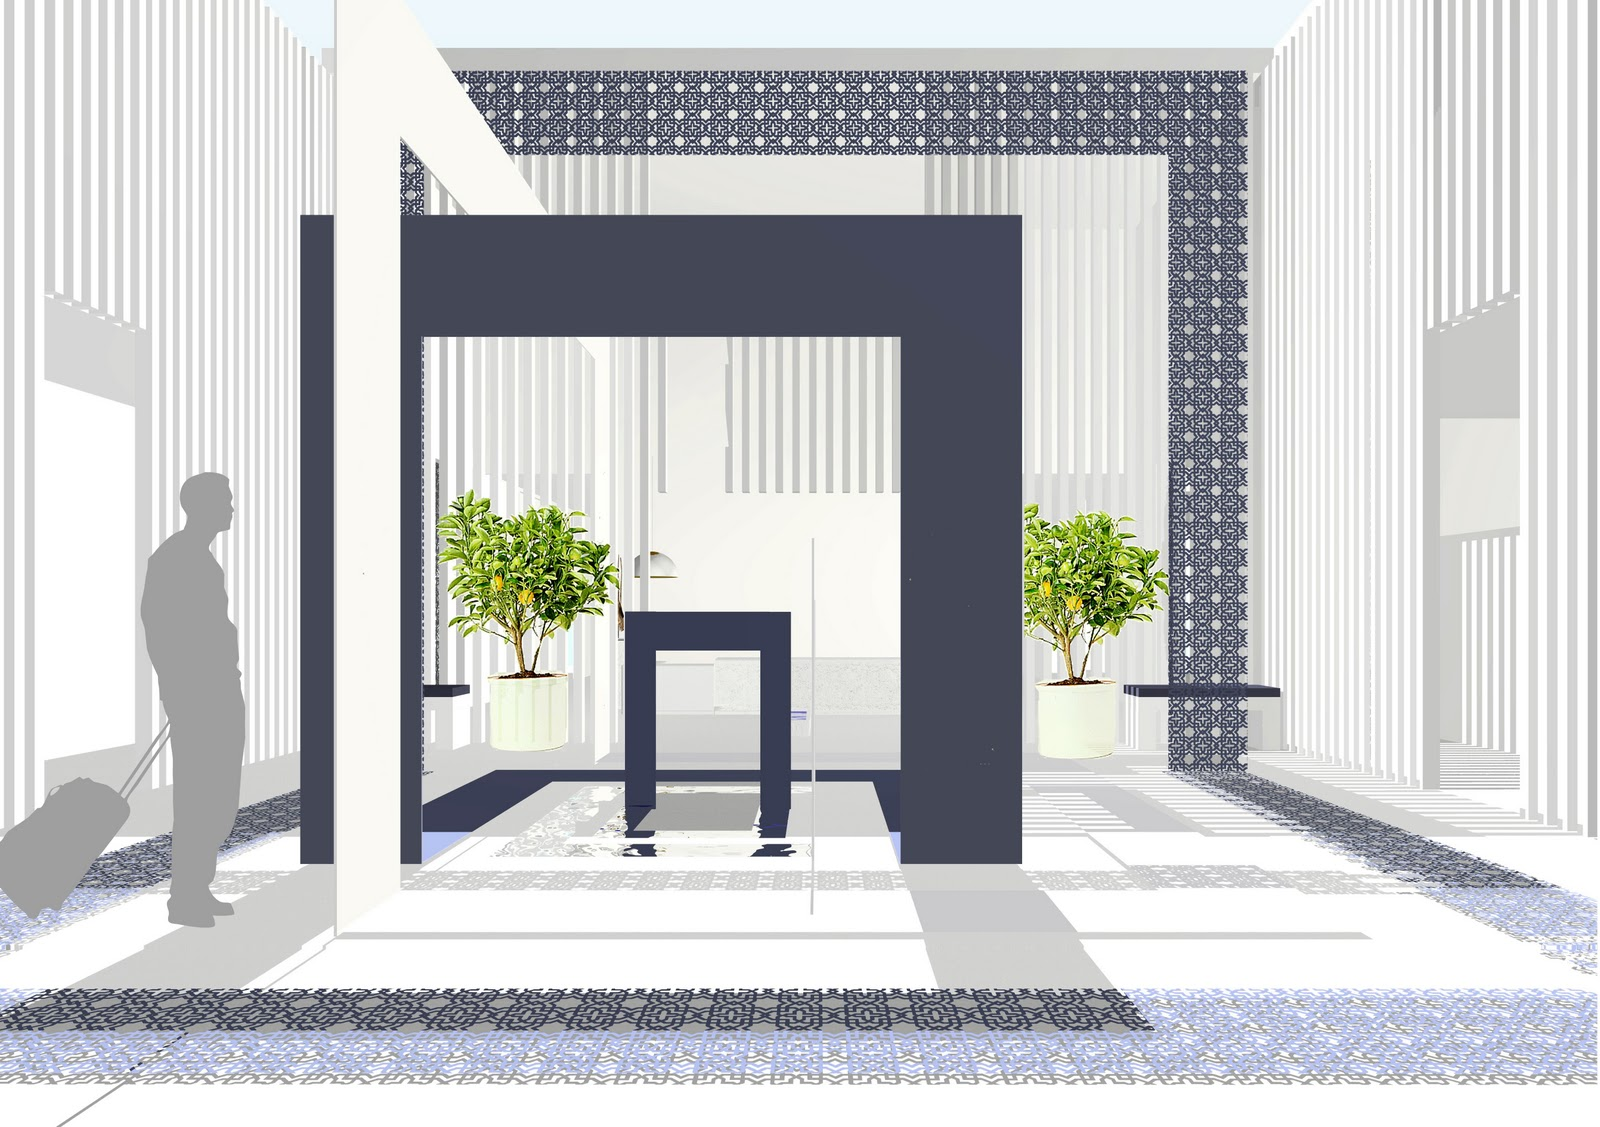 Inspiration, interiors and